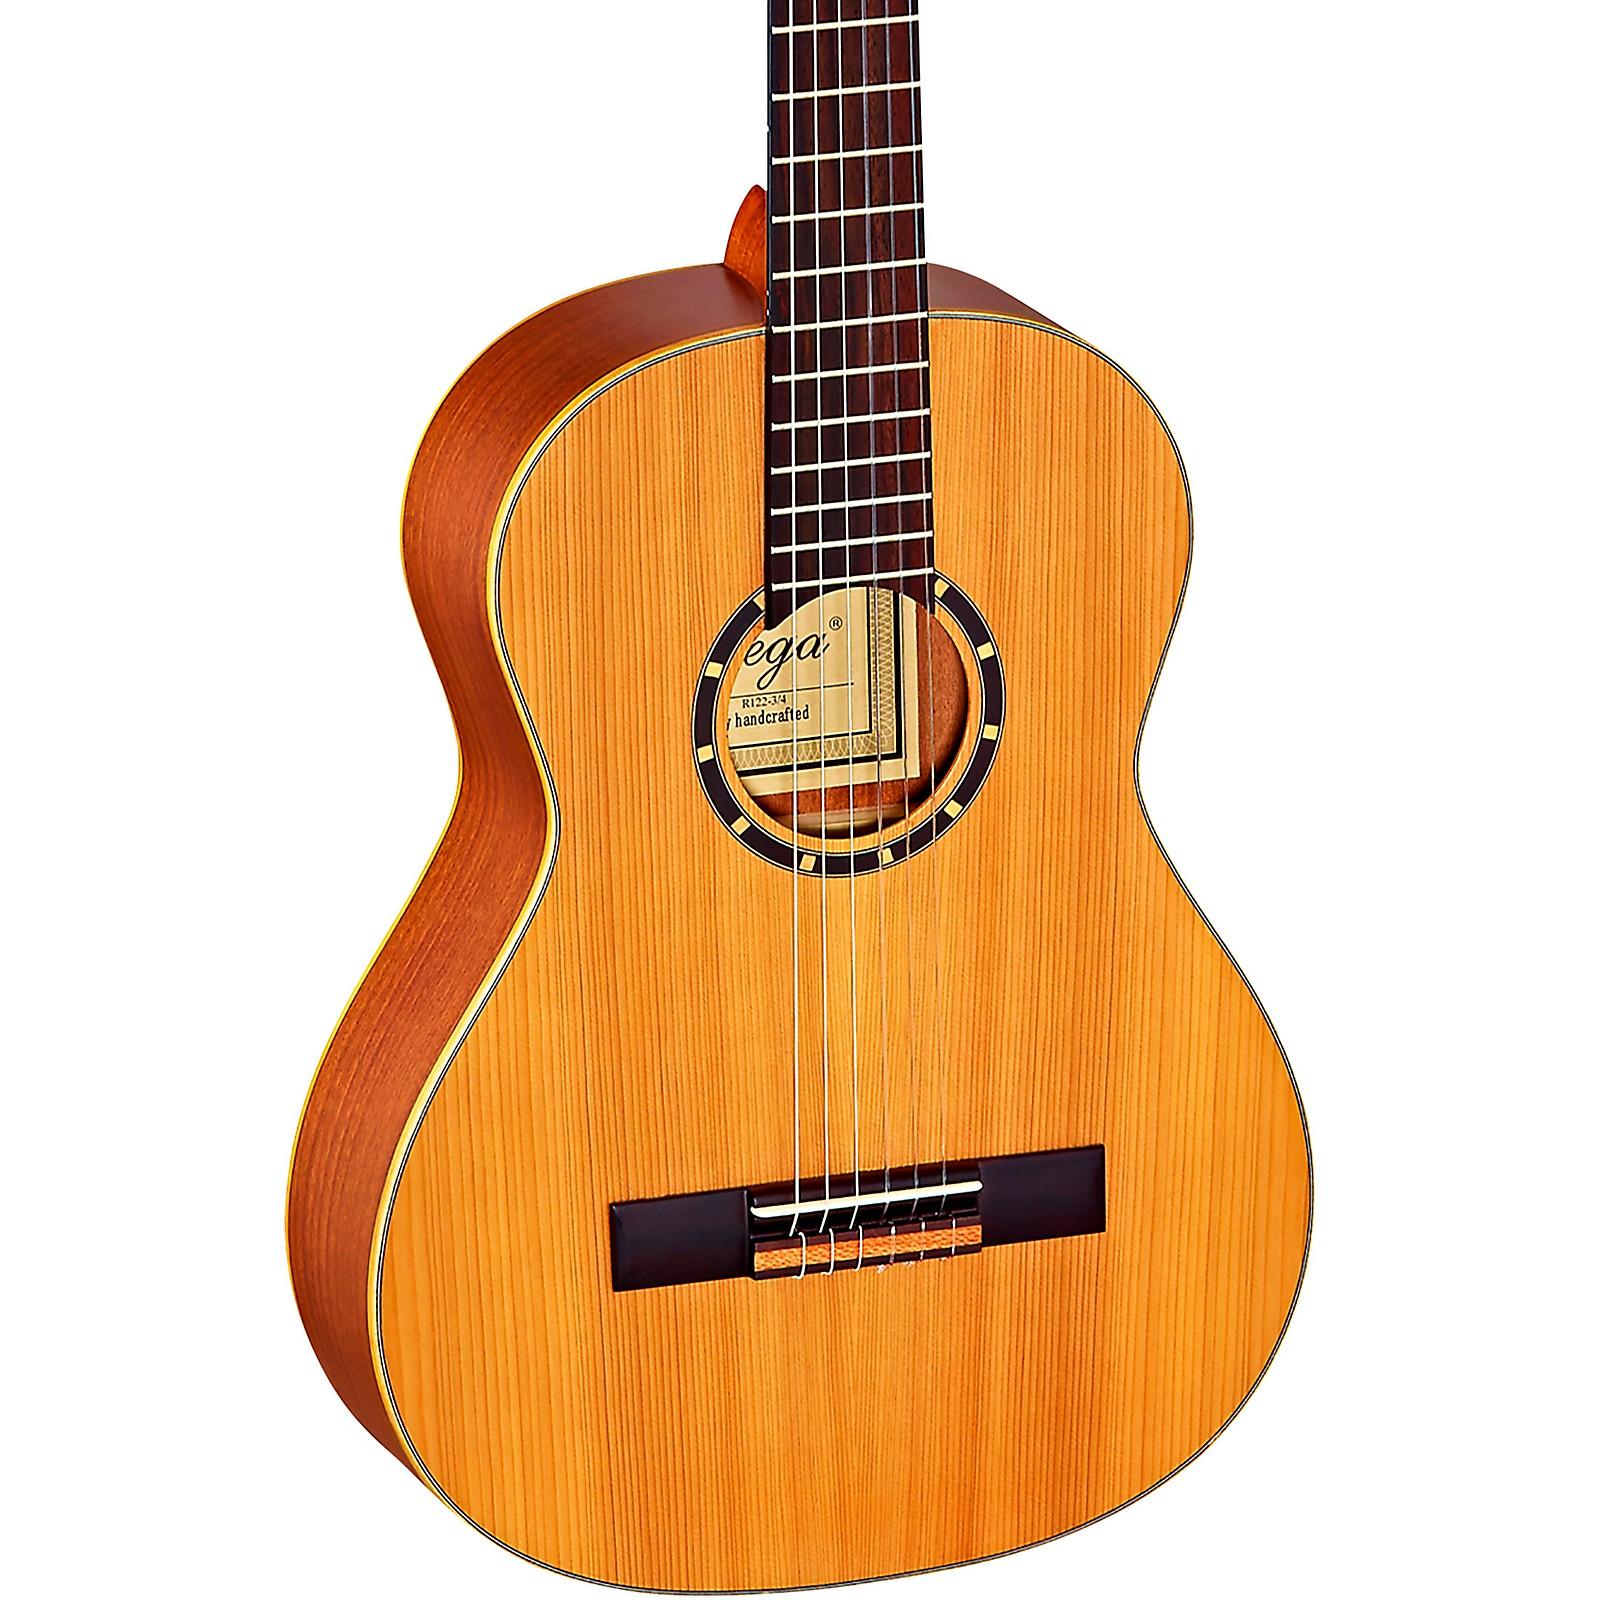 Ortega Family Series R122-3/4 3/4 Size Classical Guitar